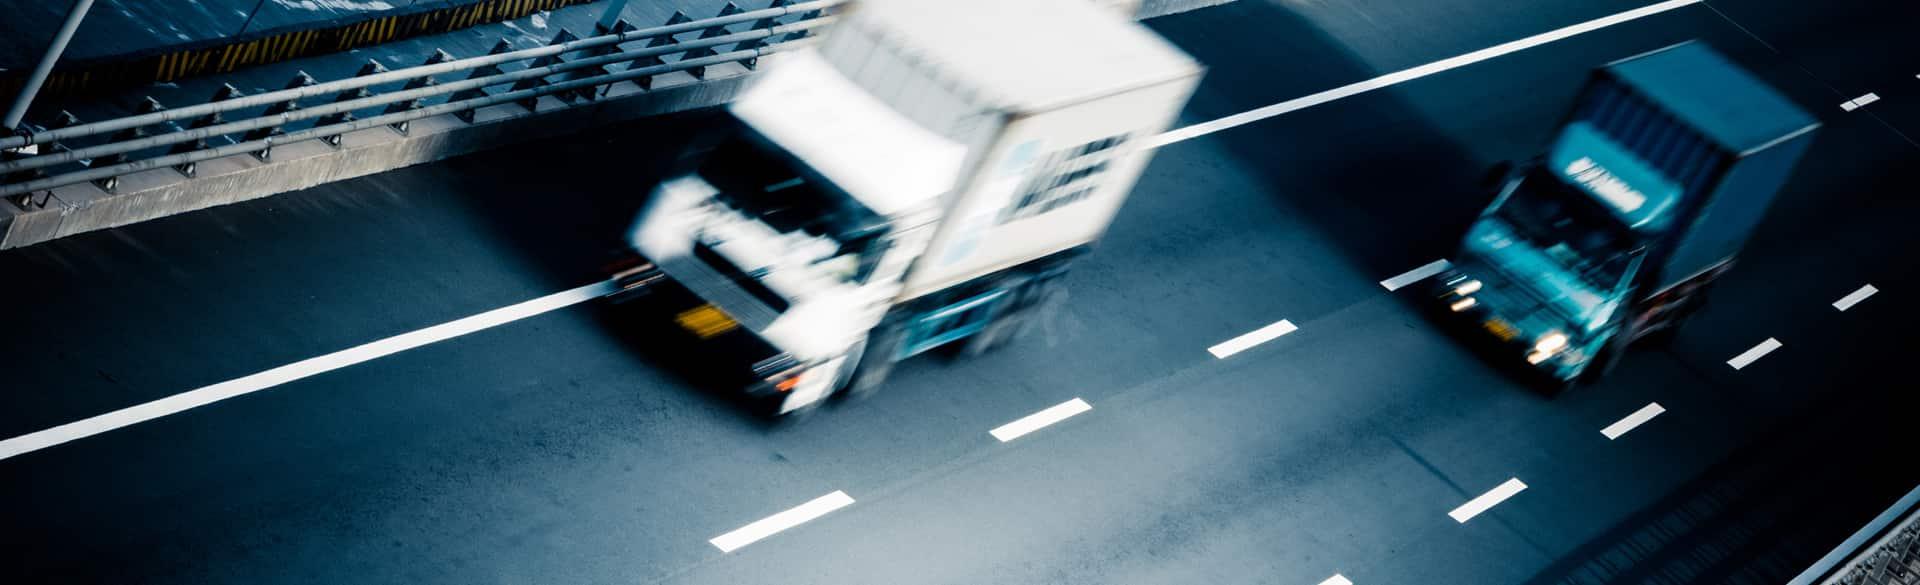 medica-logistik KG - Startseite Slide Bild